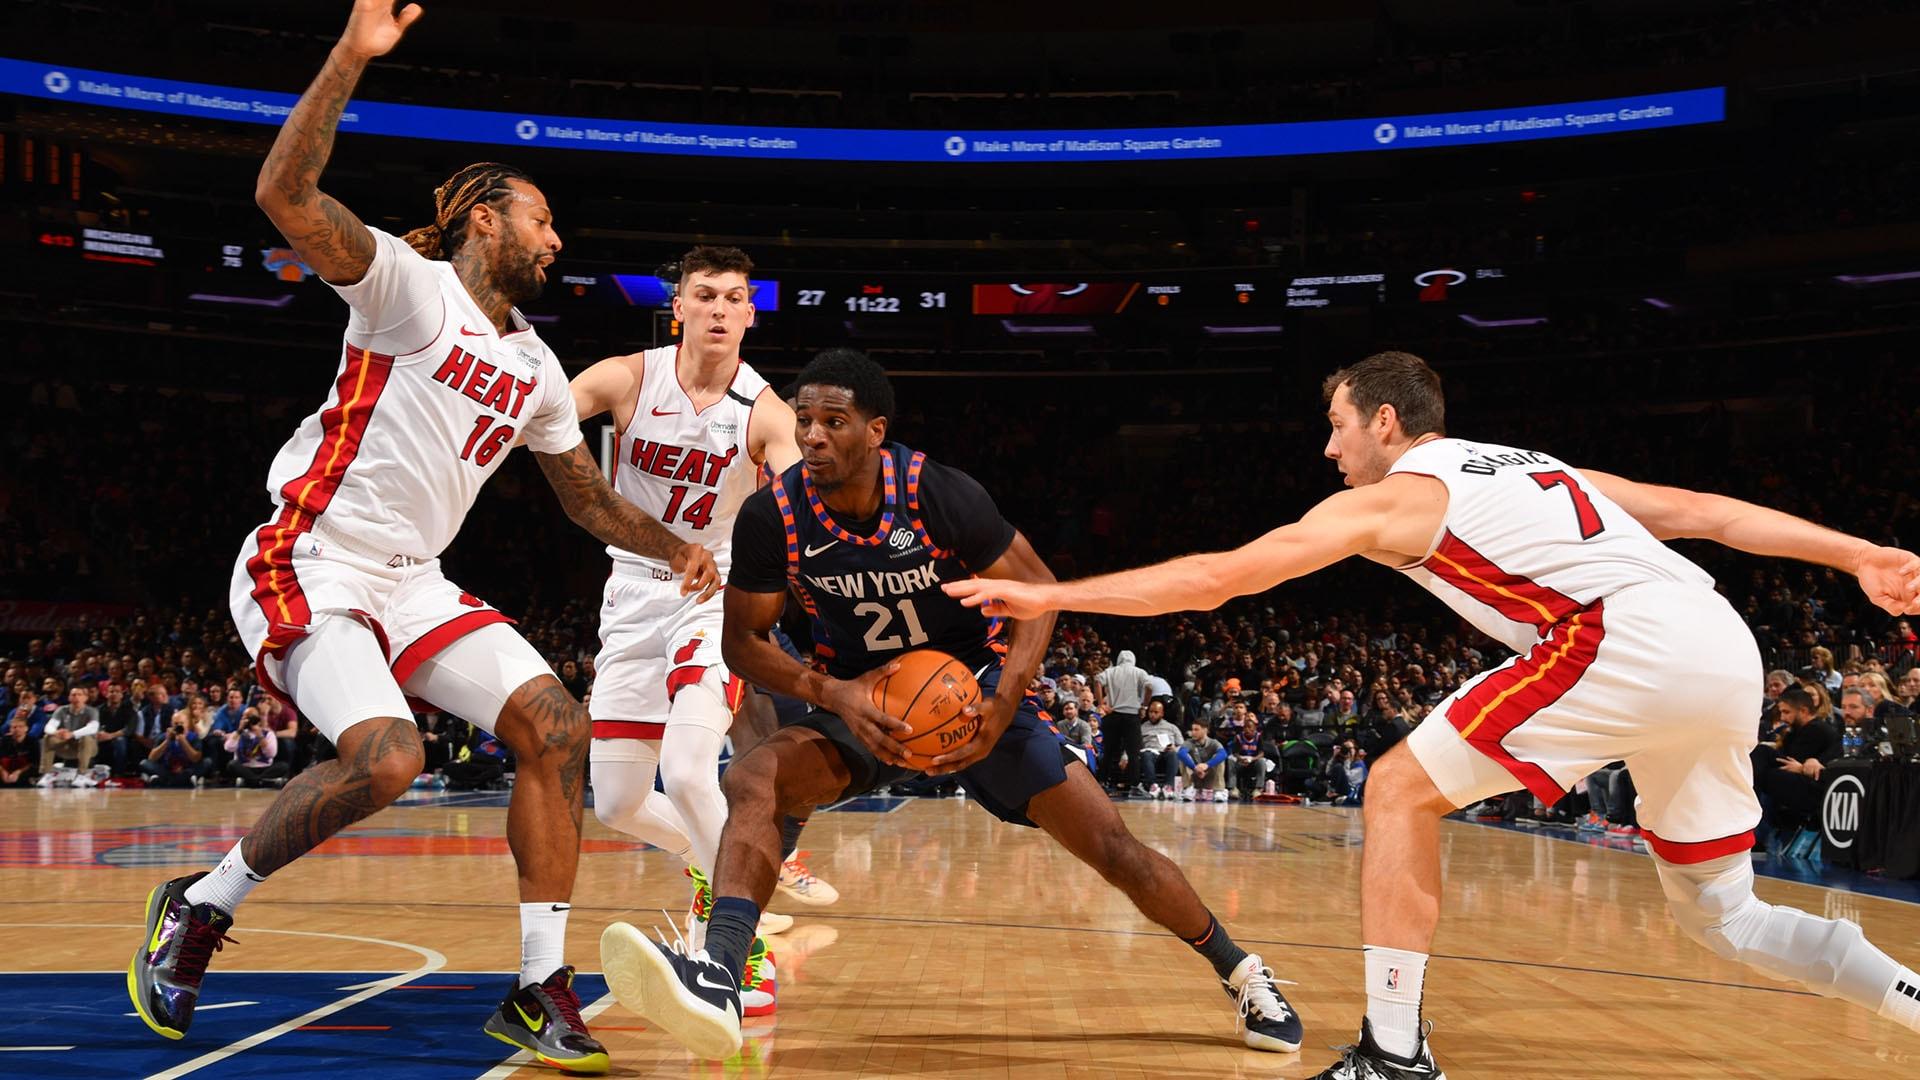 Heat @ Knicks